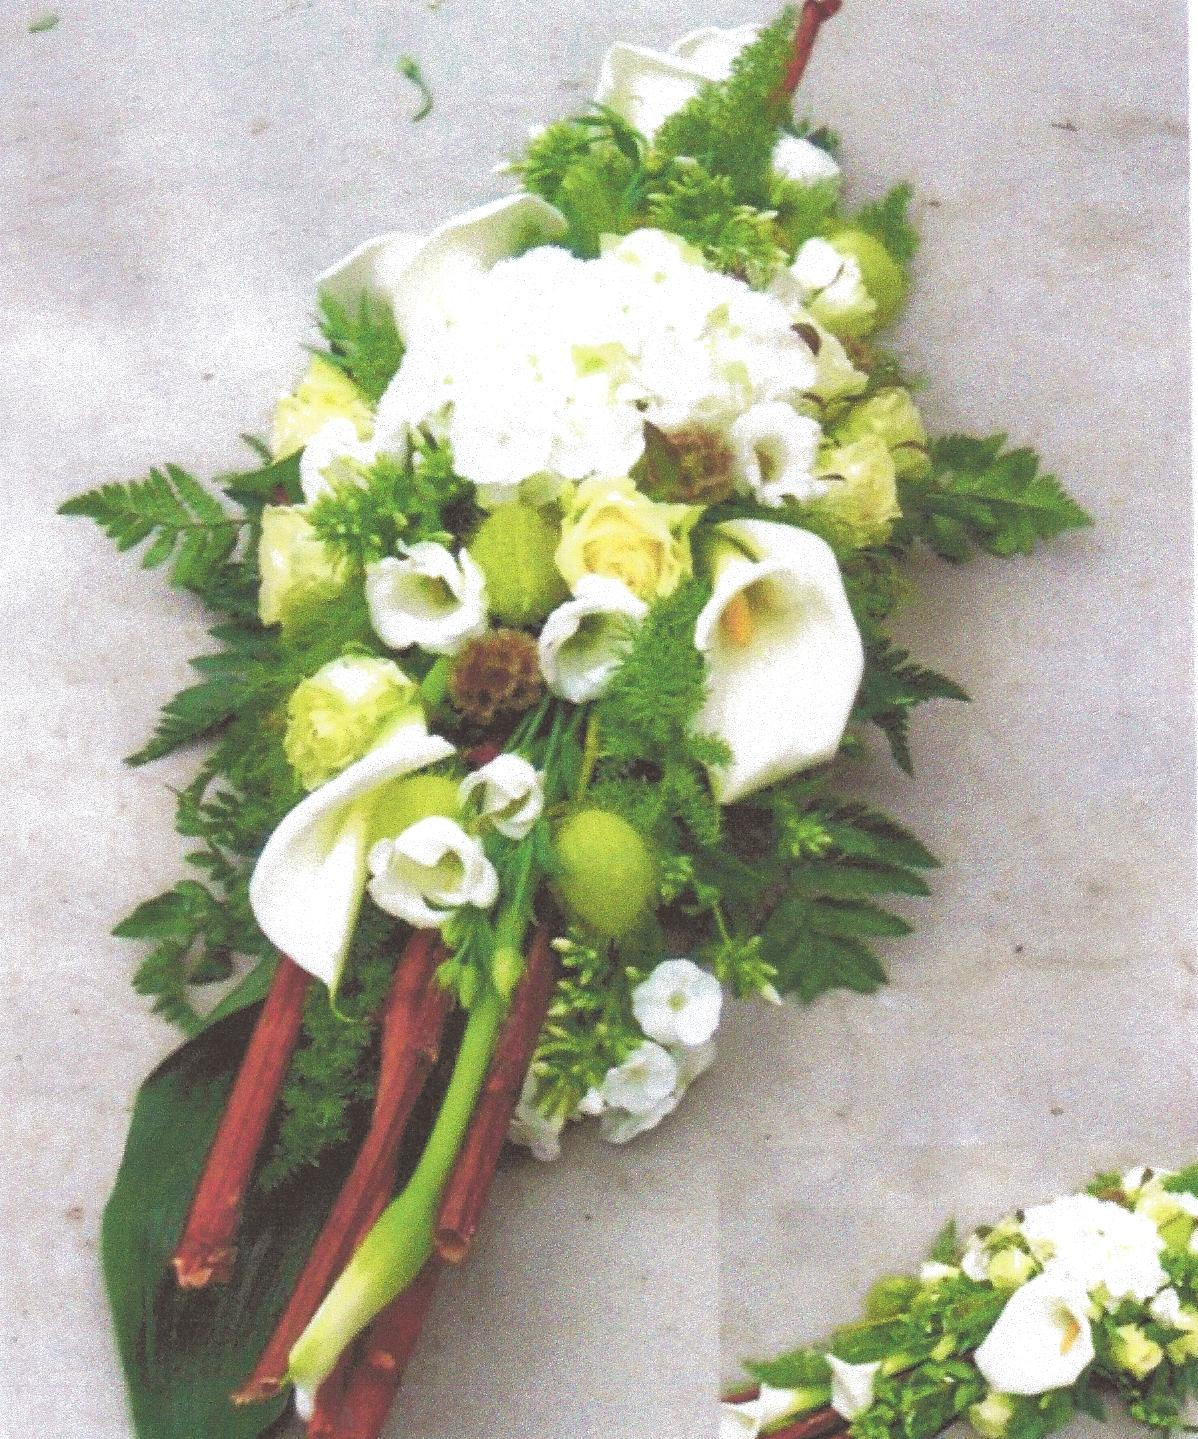 NR 8 bloemstuk calla rozen bamboo polygorum en seizoensvulling 95 euro